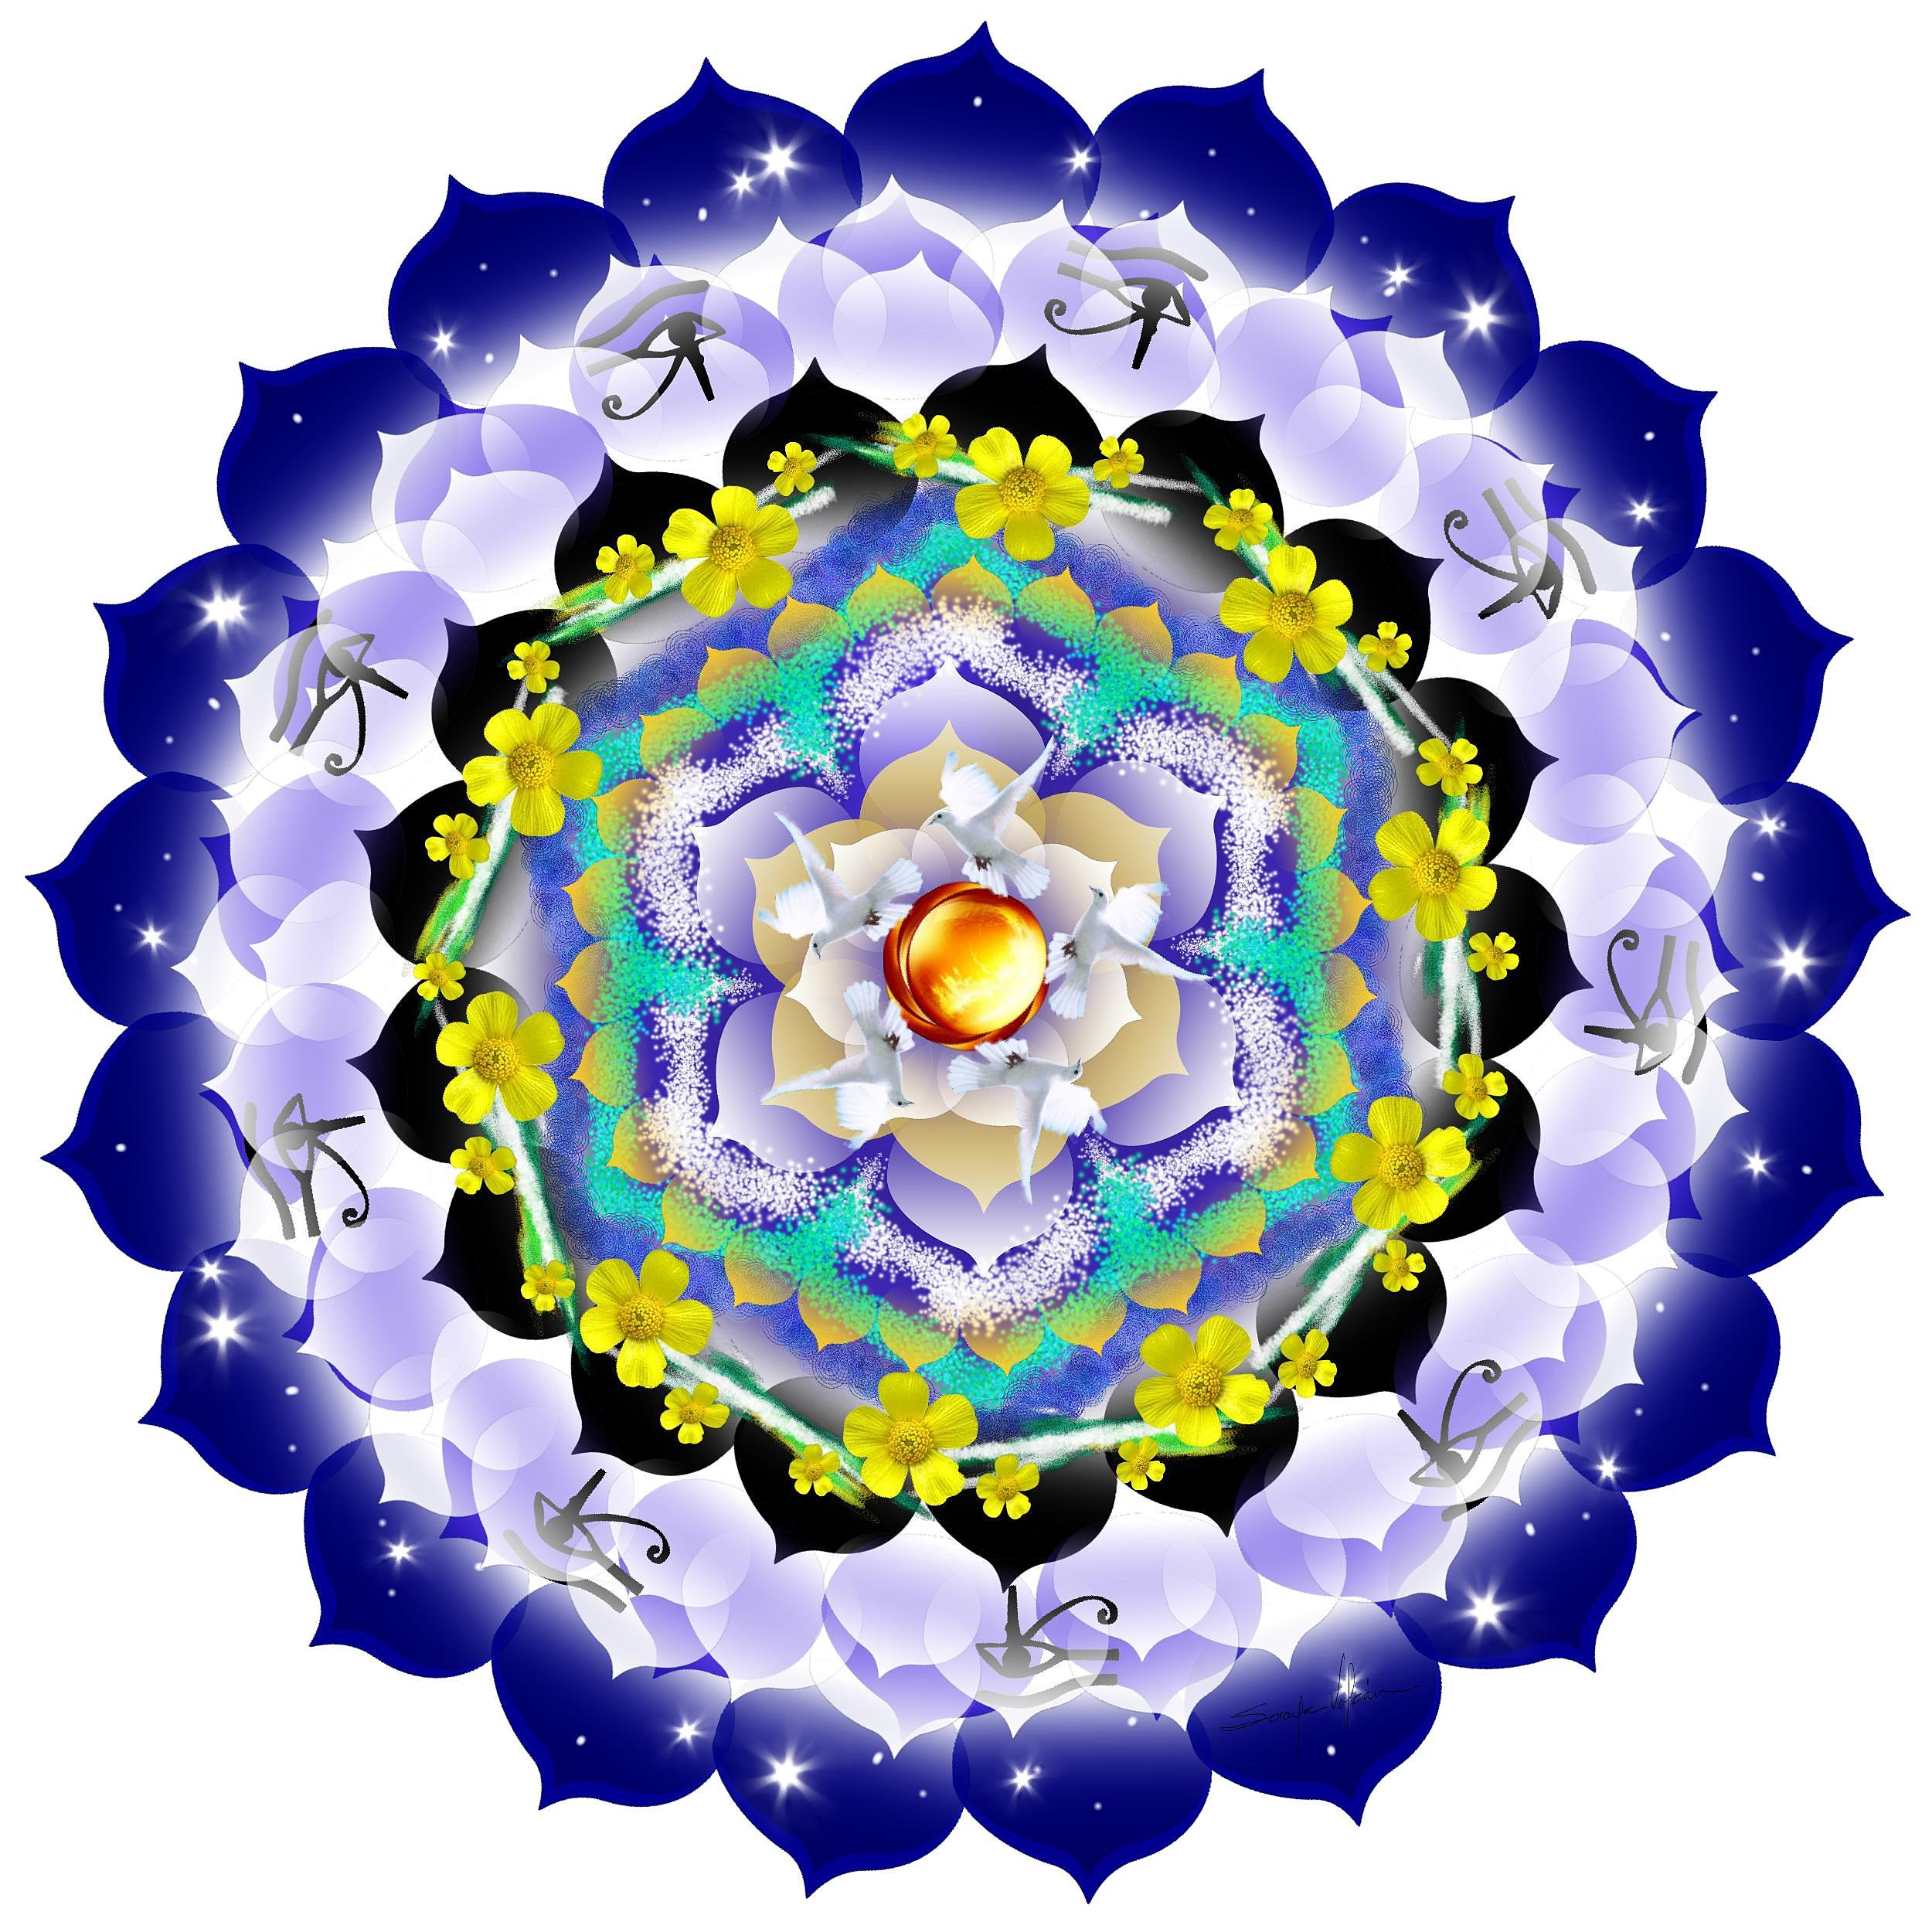 A fragment of spiritual harmony 5